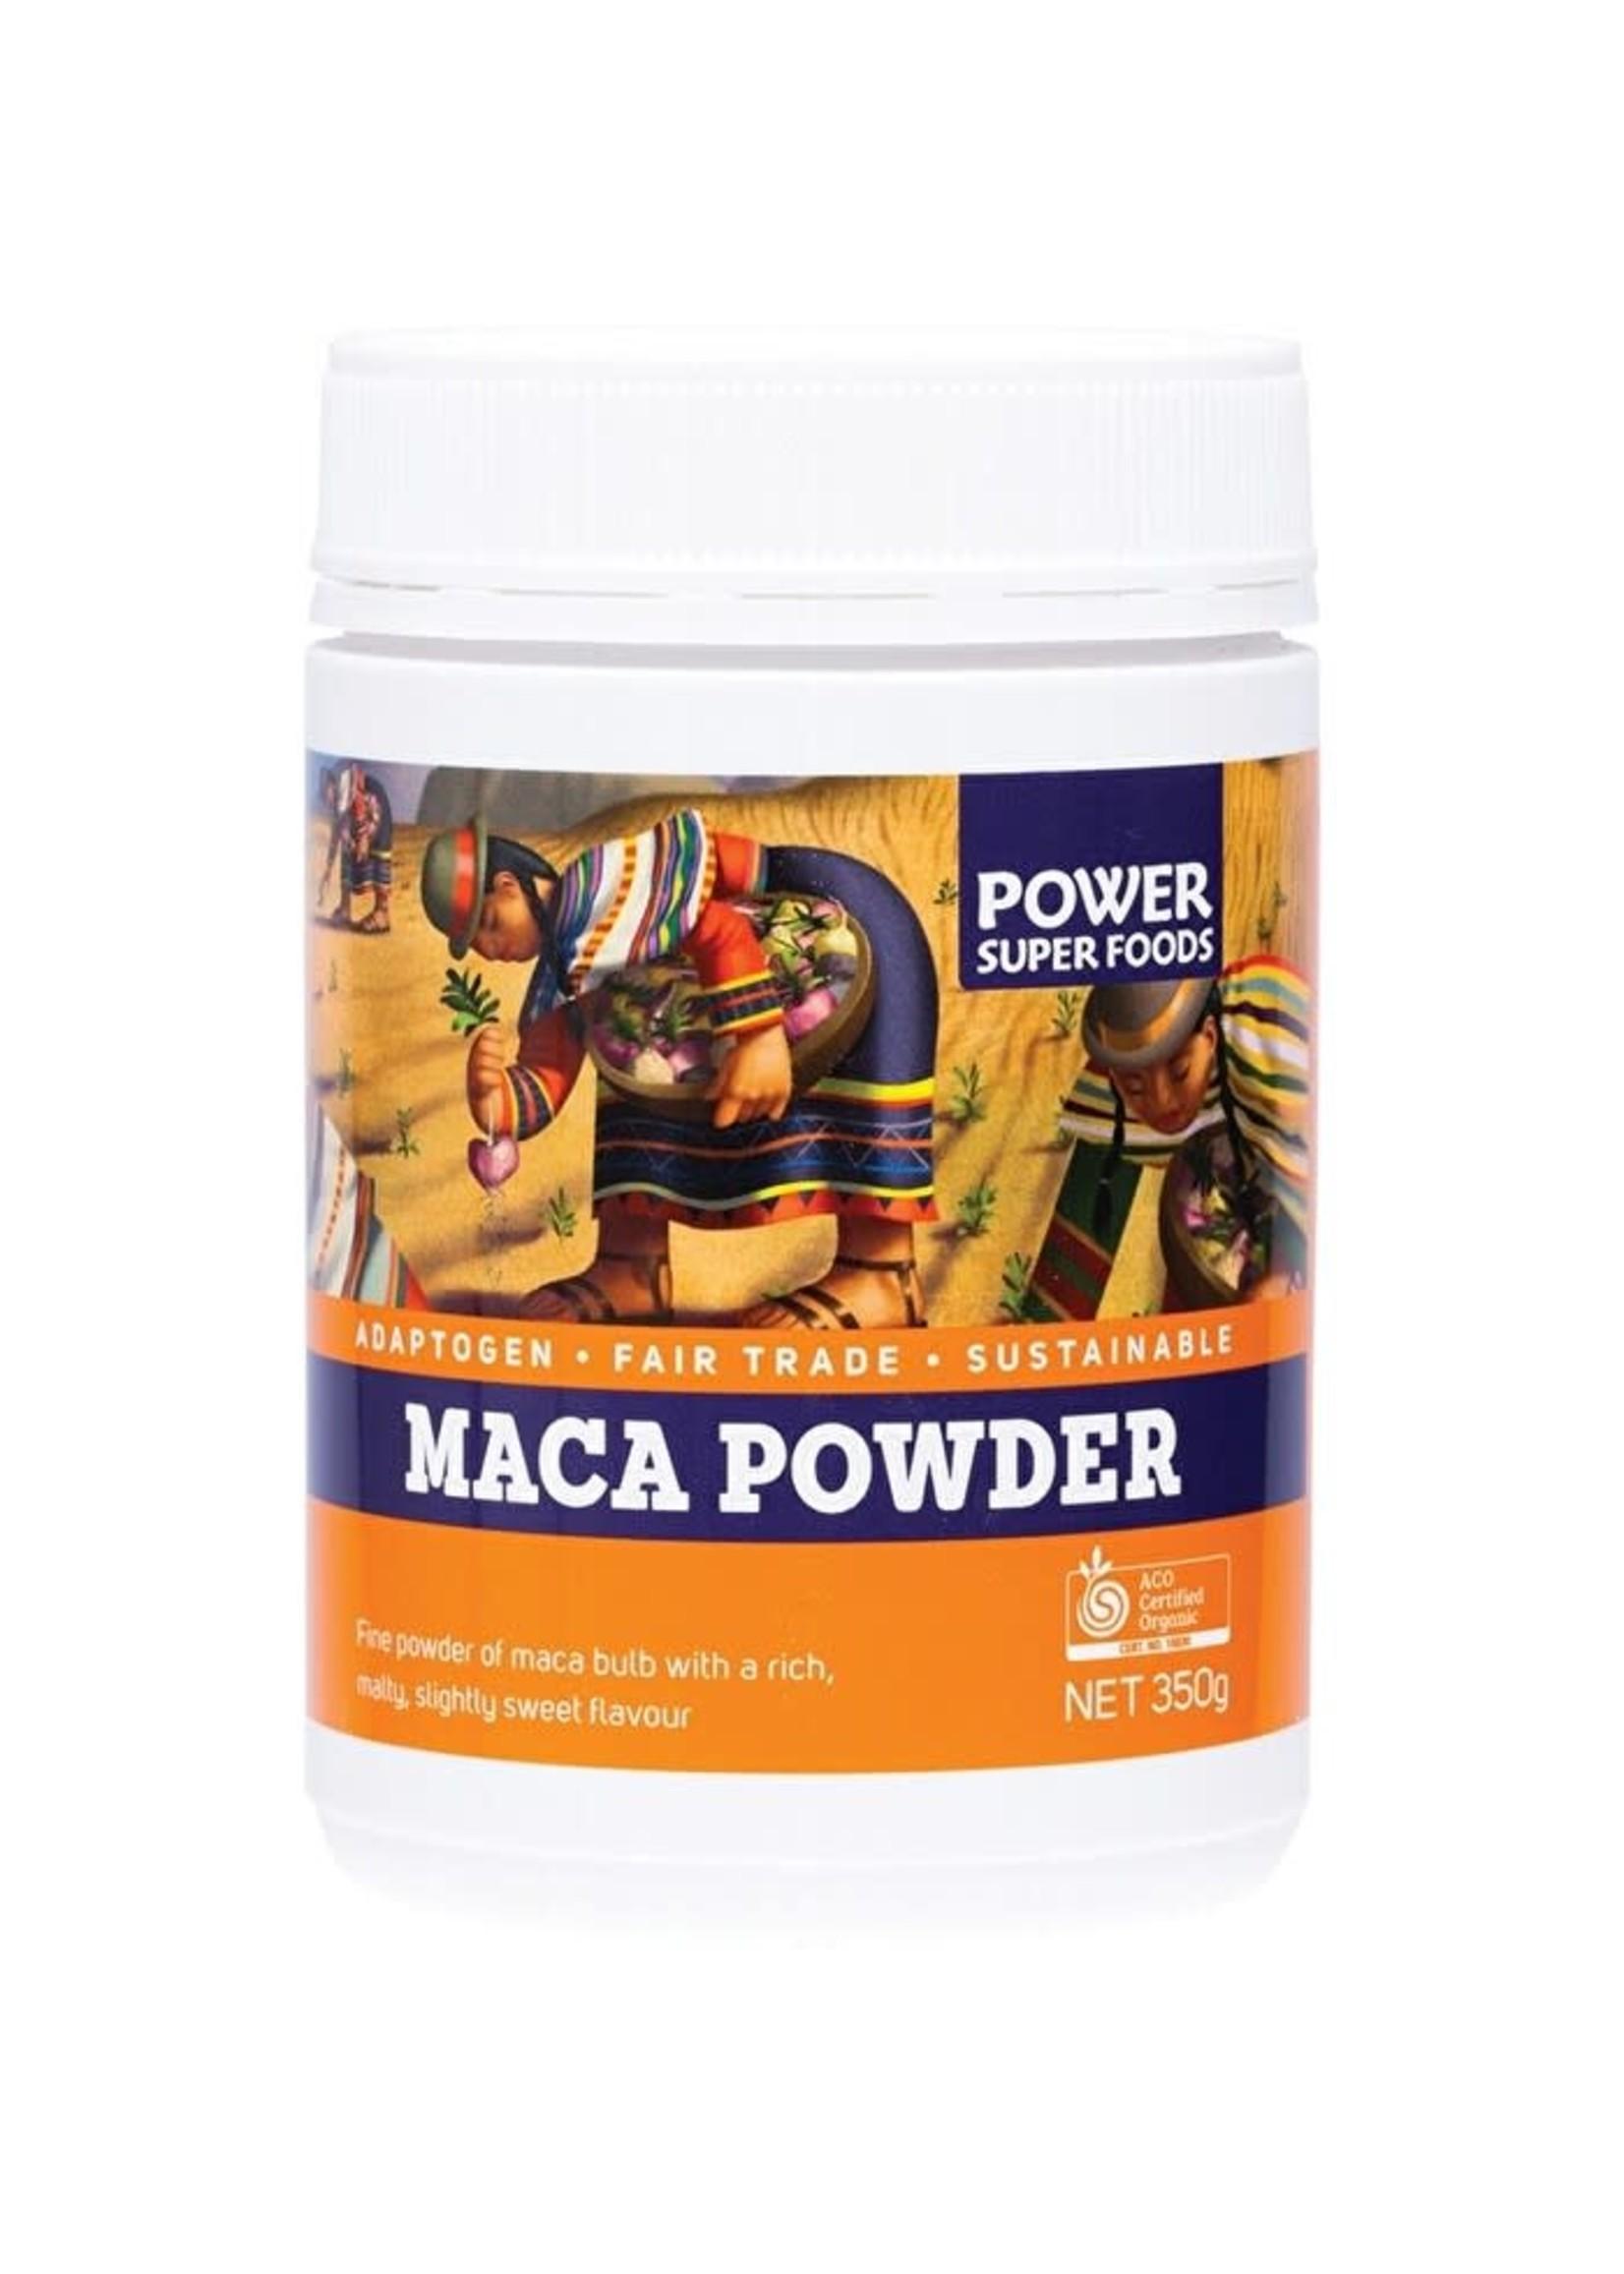 POWER SUPER FOODS Power Super Foods Maca Powder 350 g